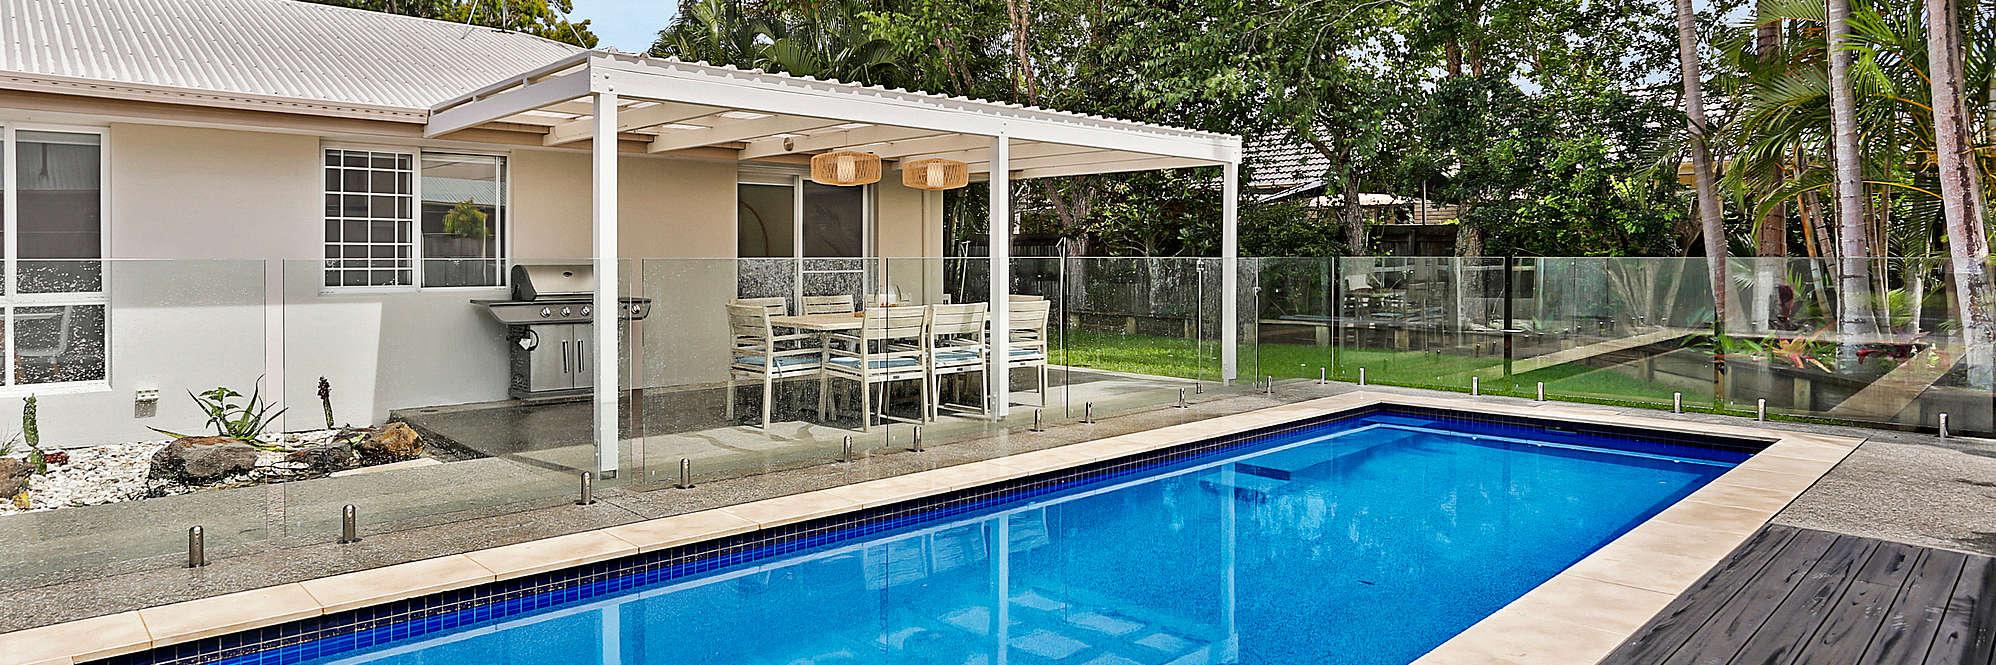 Poolside Noosa Oasis